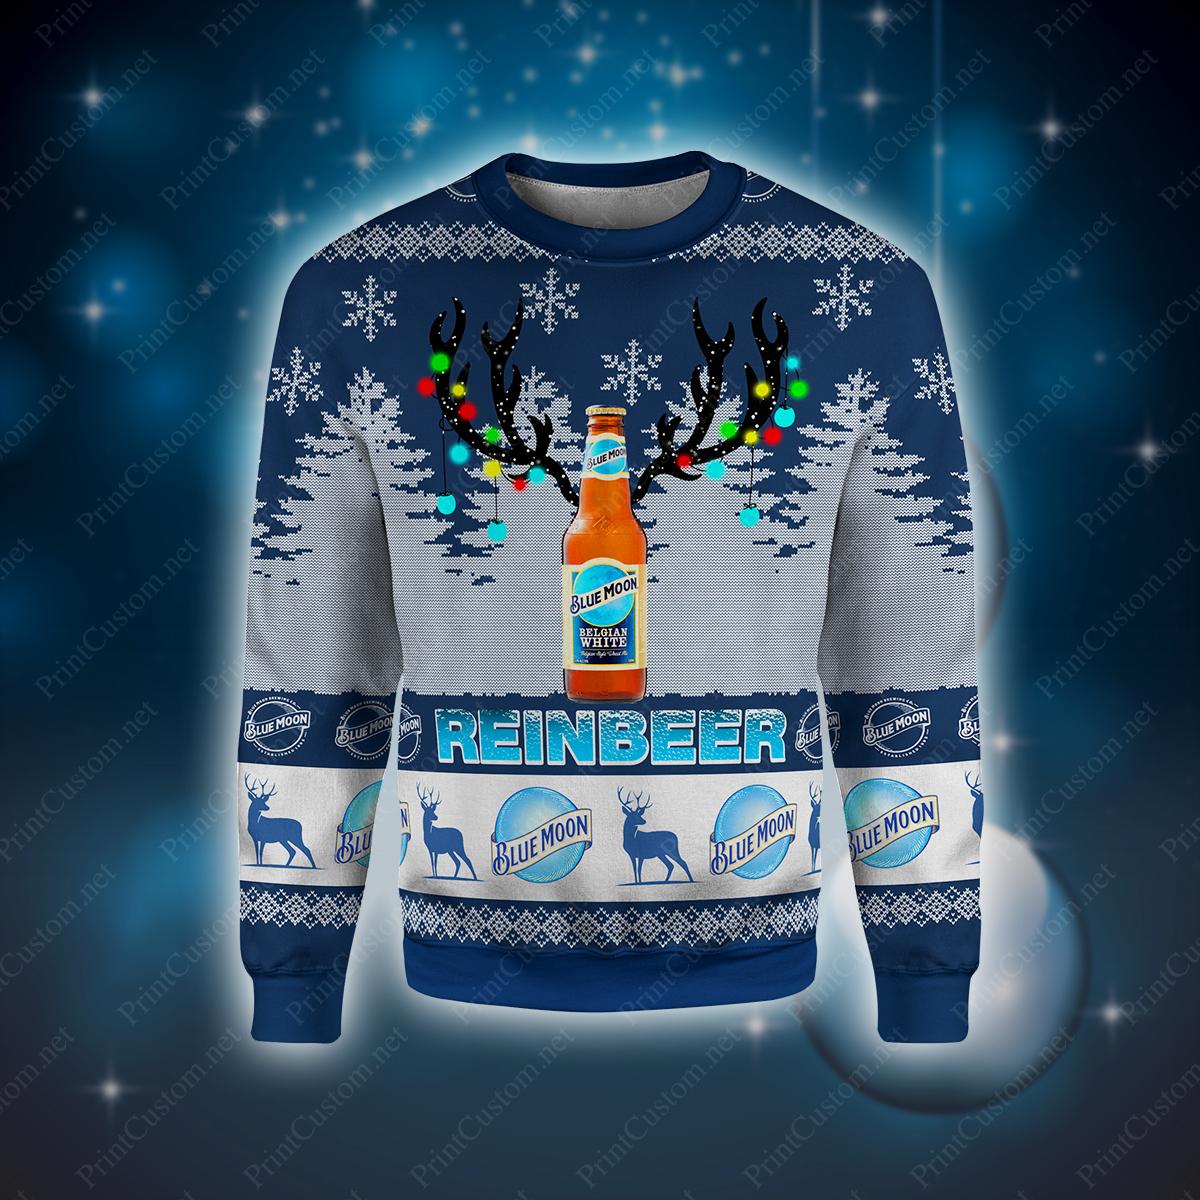 Reinbeer blue moon full printing ugly christmas sweater 3